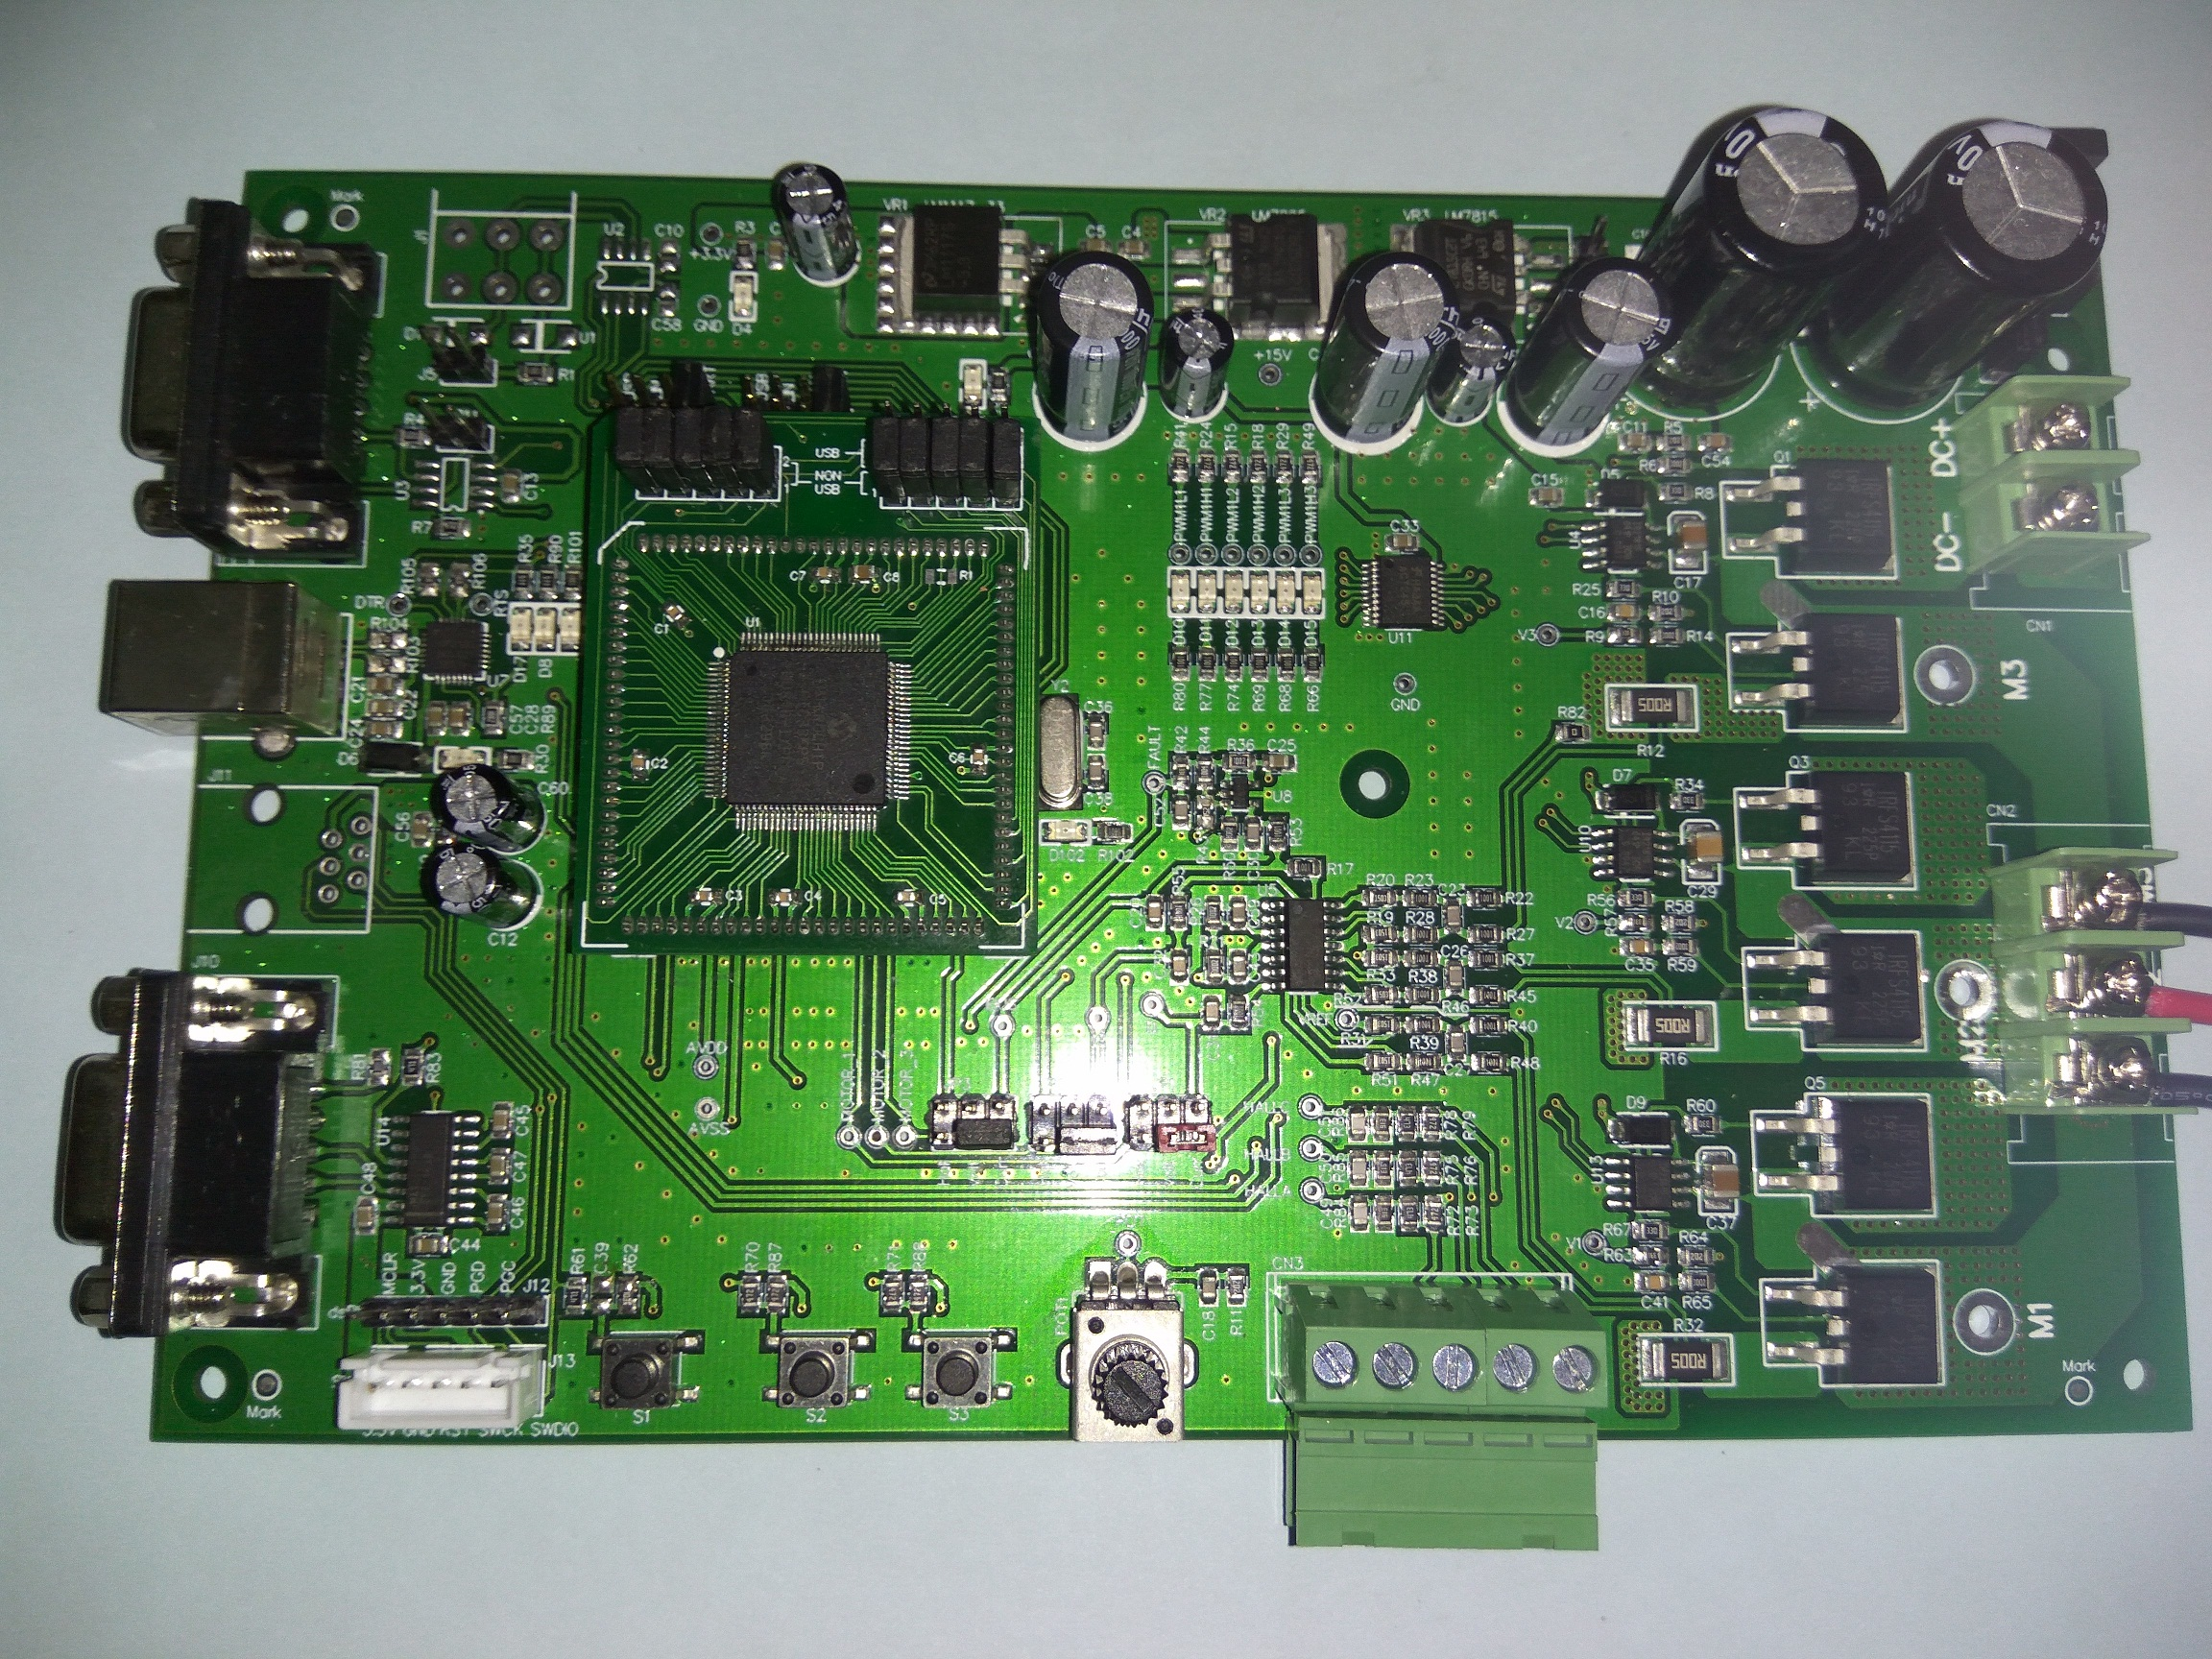 Categoryscientific Experiment Equipmentproductnamemicrochip Mclv Details About Ka2284 Integrated Circuit Microchip Dspic33ep512mu810 Pmsm Foc Dc Brushless Motor Development Board